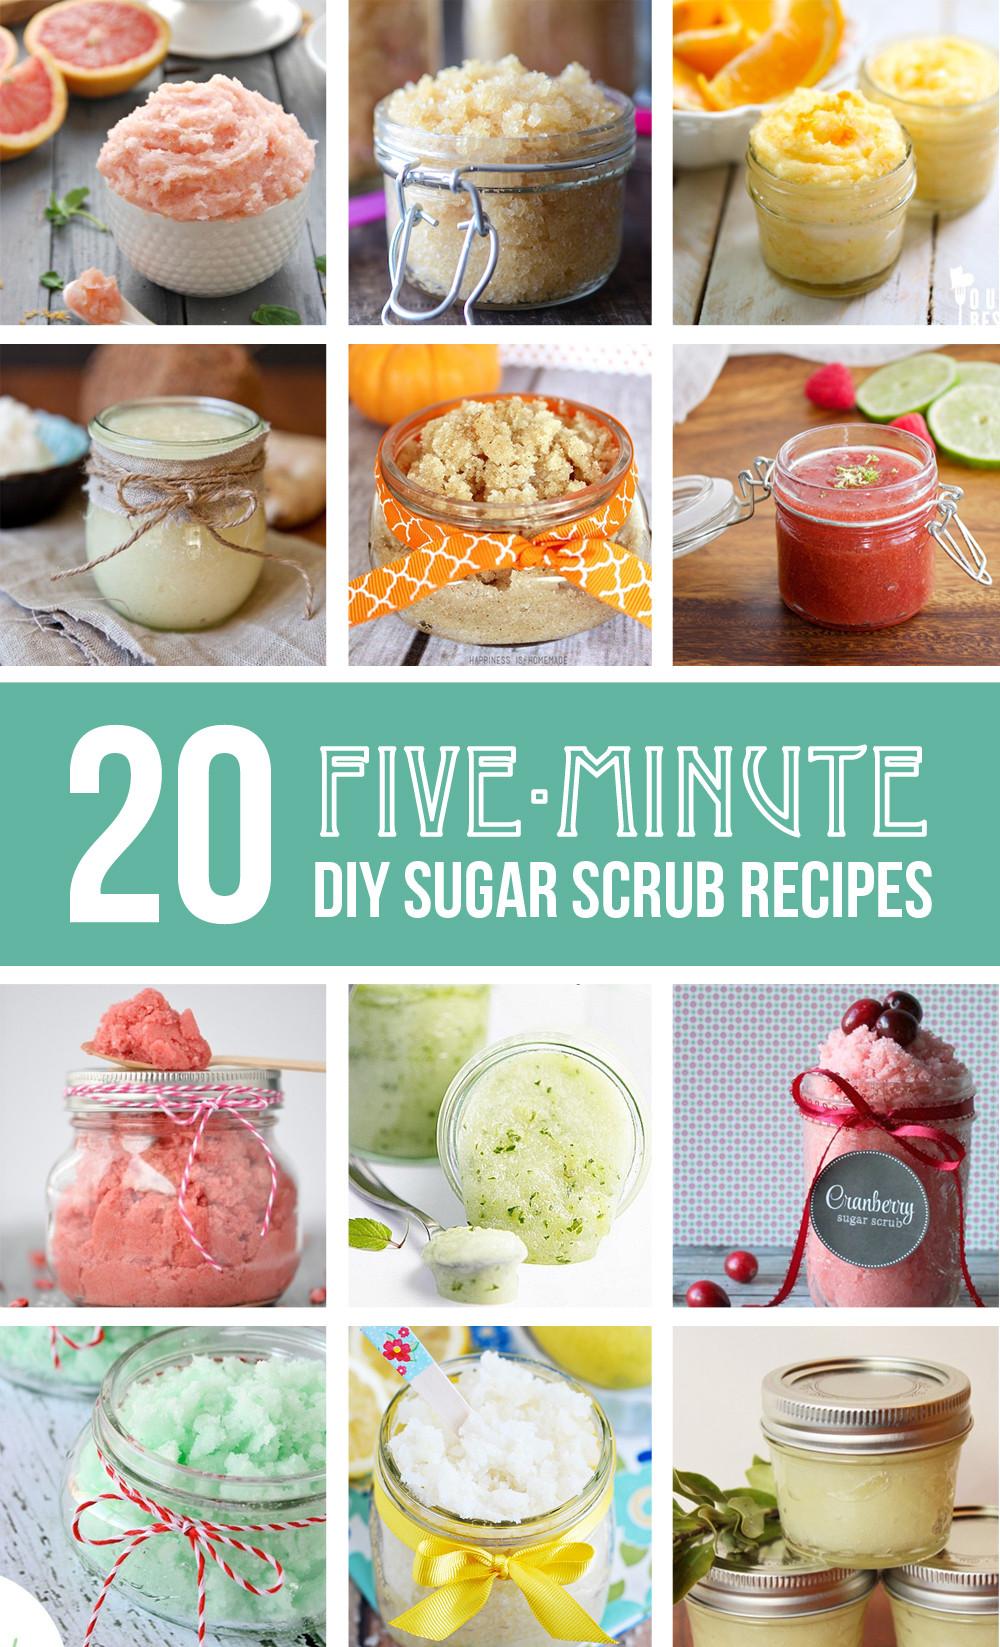 Best ideas about DIY Sugar Scrub . Save or Pin 20 five minute DIY Sugar Scrub Recipes Now.